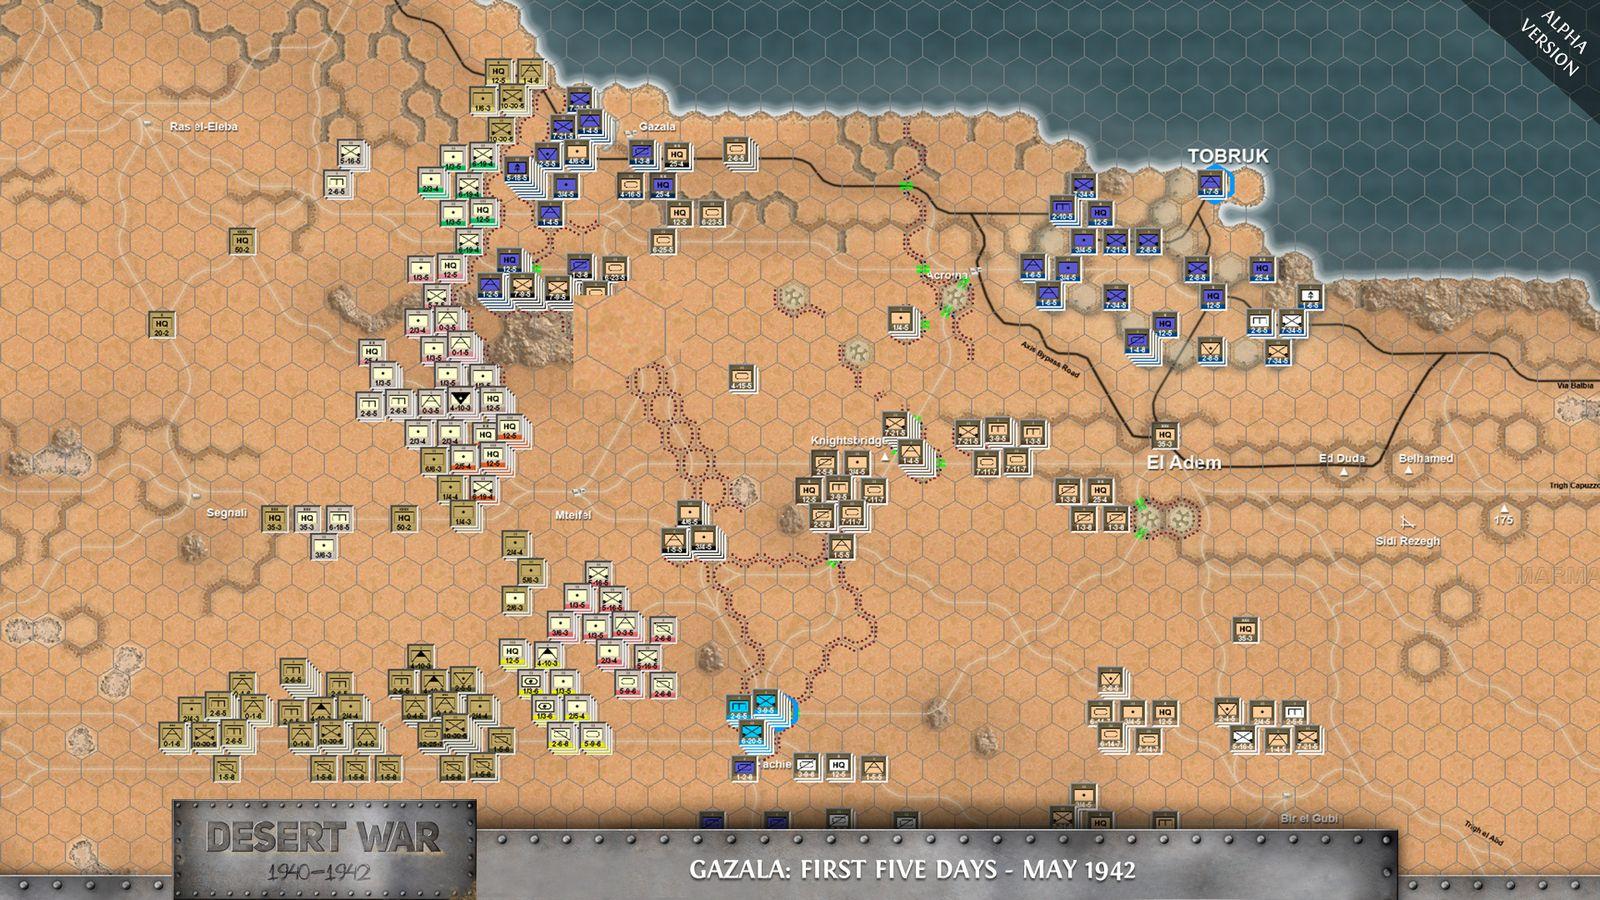 desert-war-40-42-0717-8-Gazala_First_Five_Days